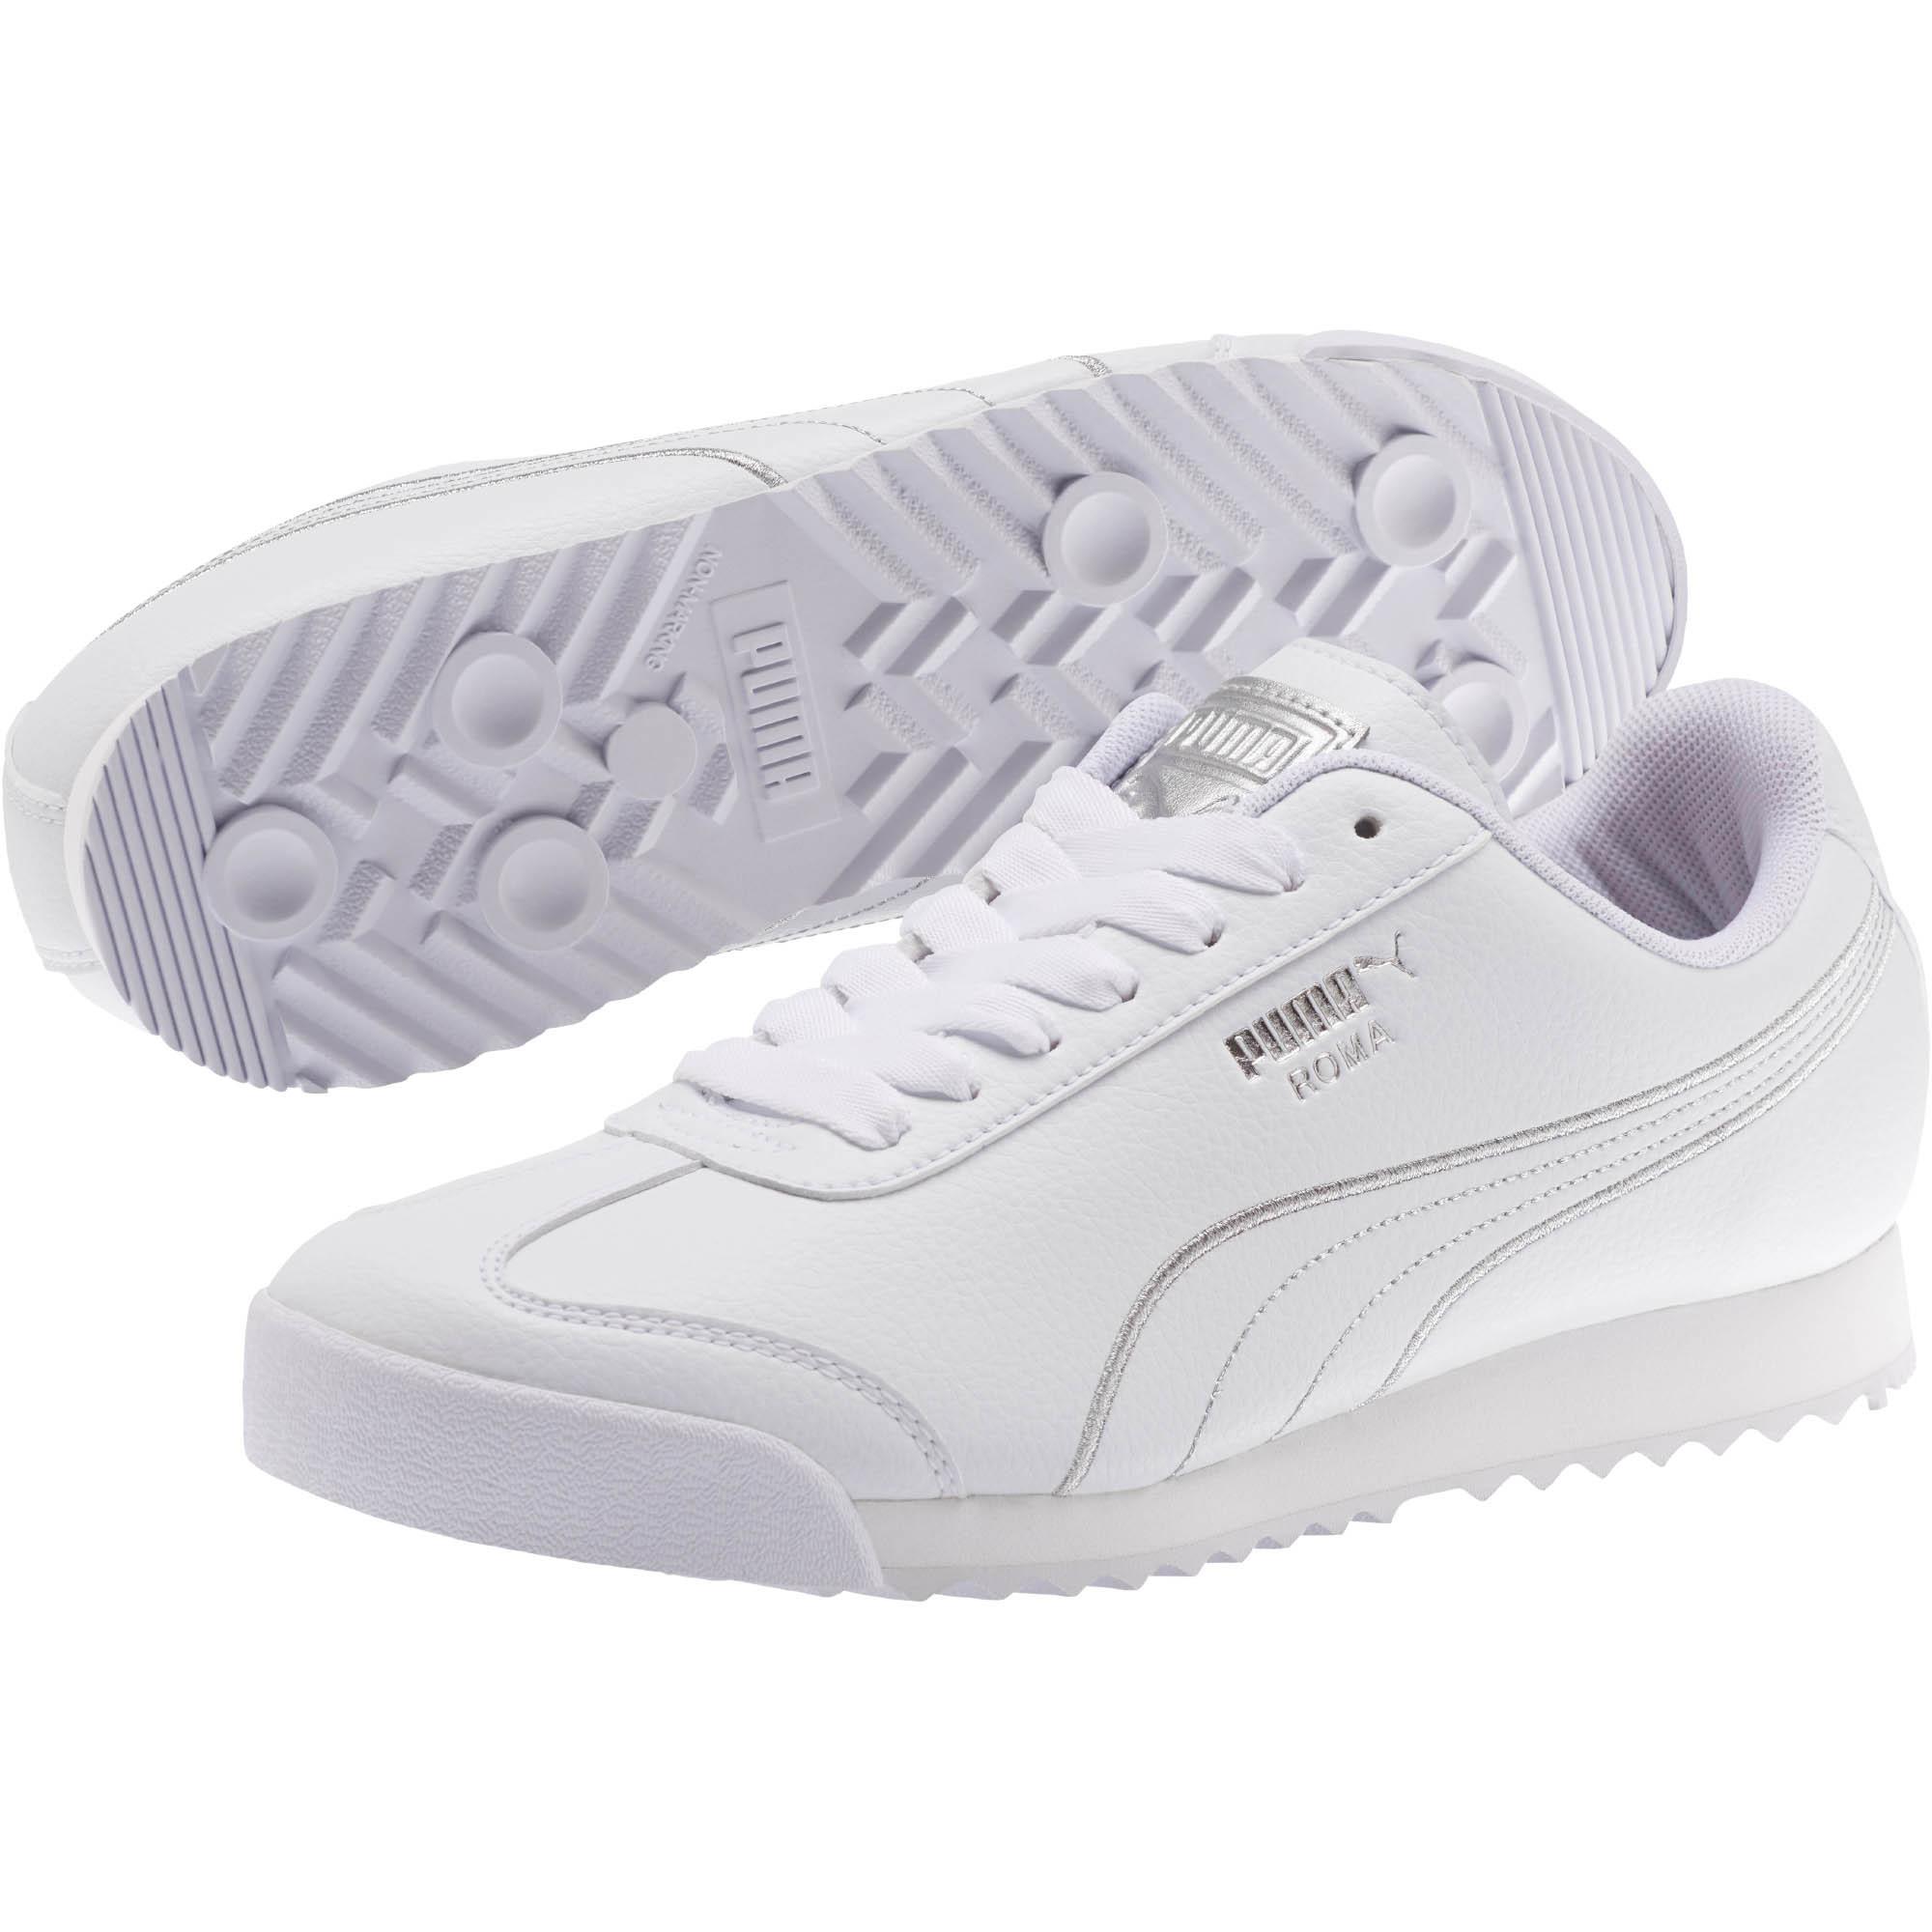 pretty nice 079c9 0b500 PUMA Roma Metallic Stitch Women s Sneakers Women Shoe Sport Classics 0